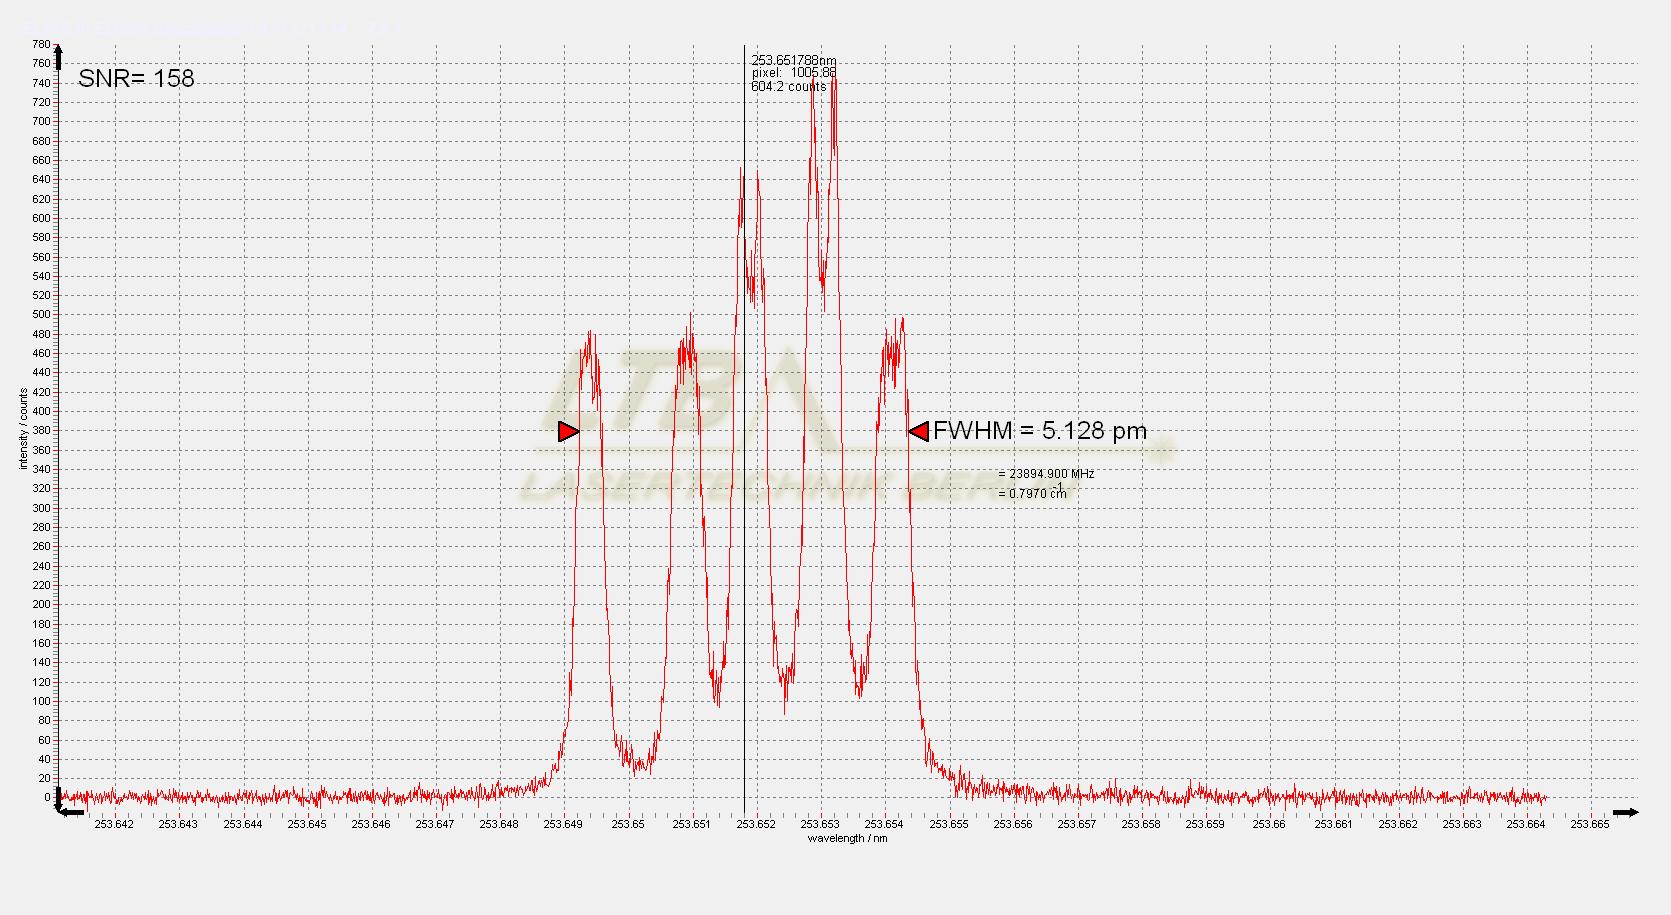 ELIAS III Hg spectrum